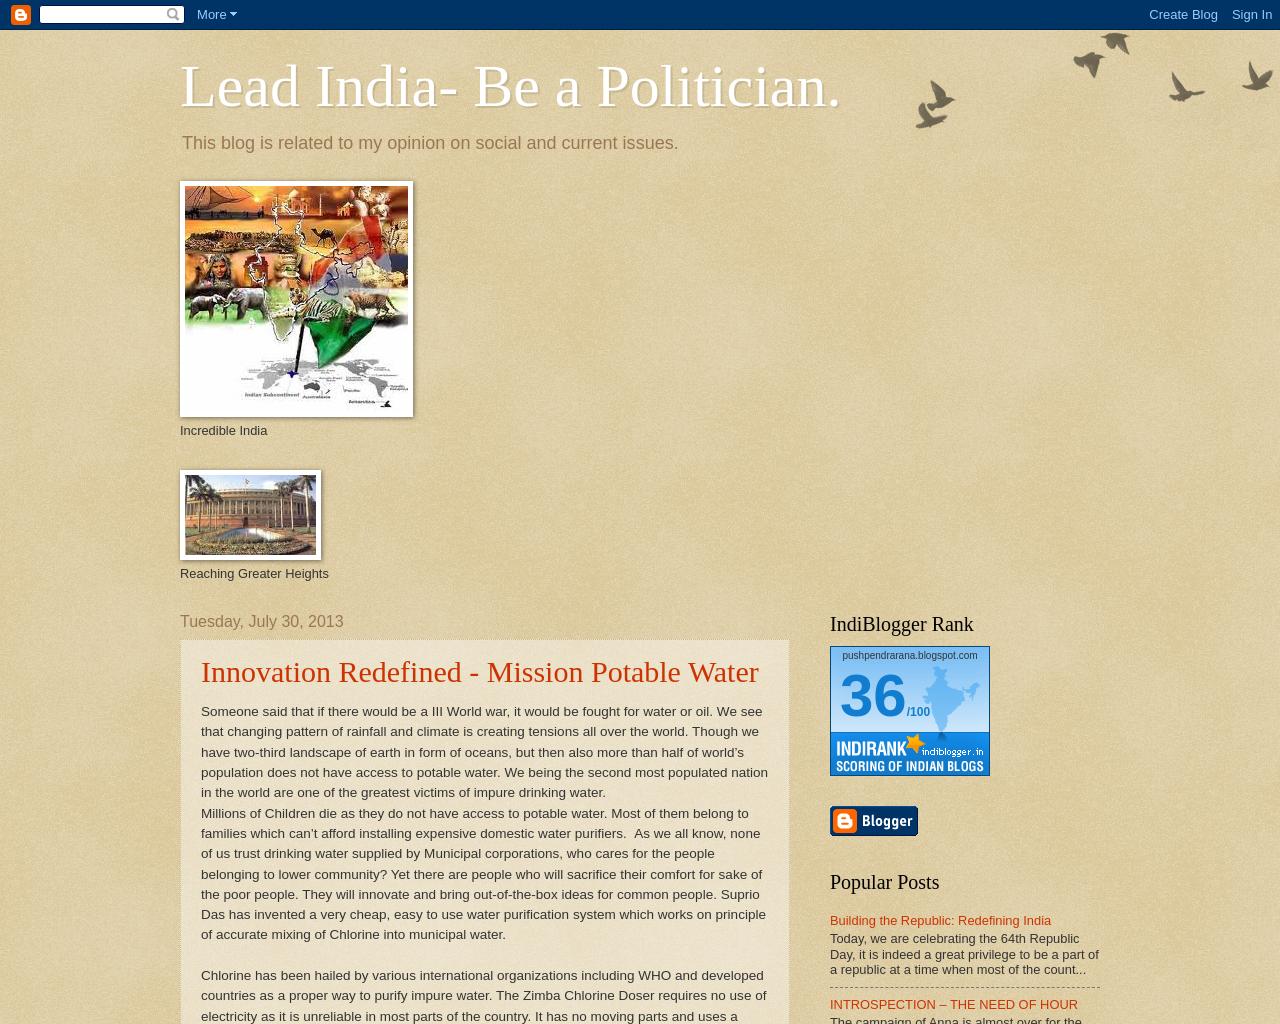 Lead India - Be a Politician